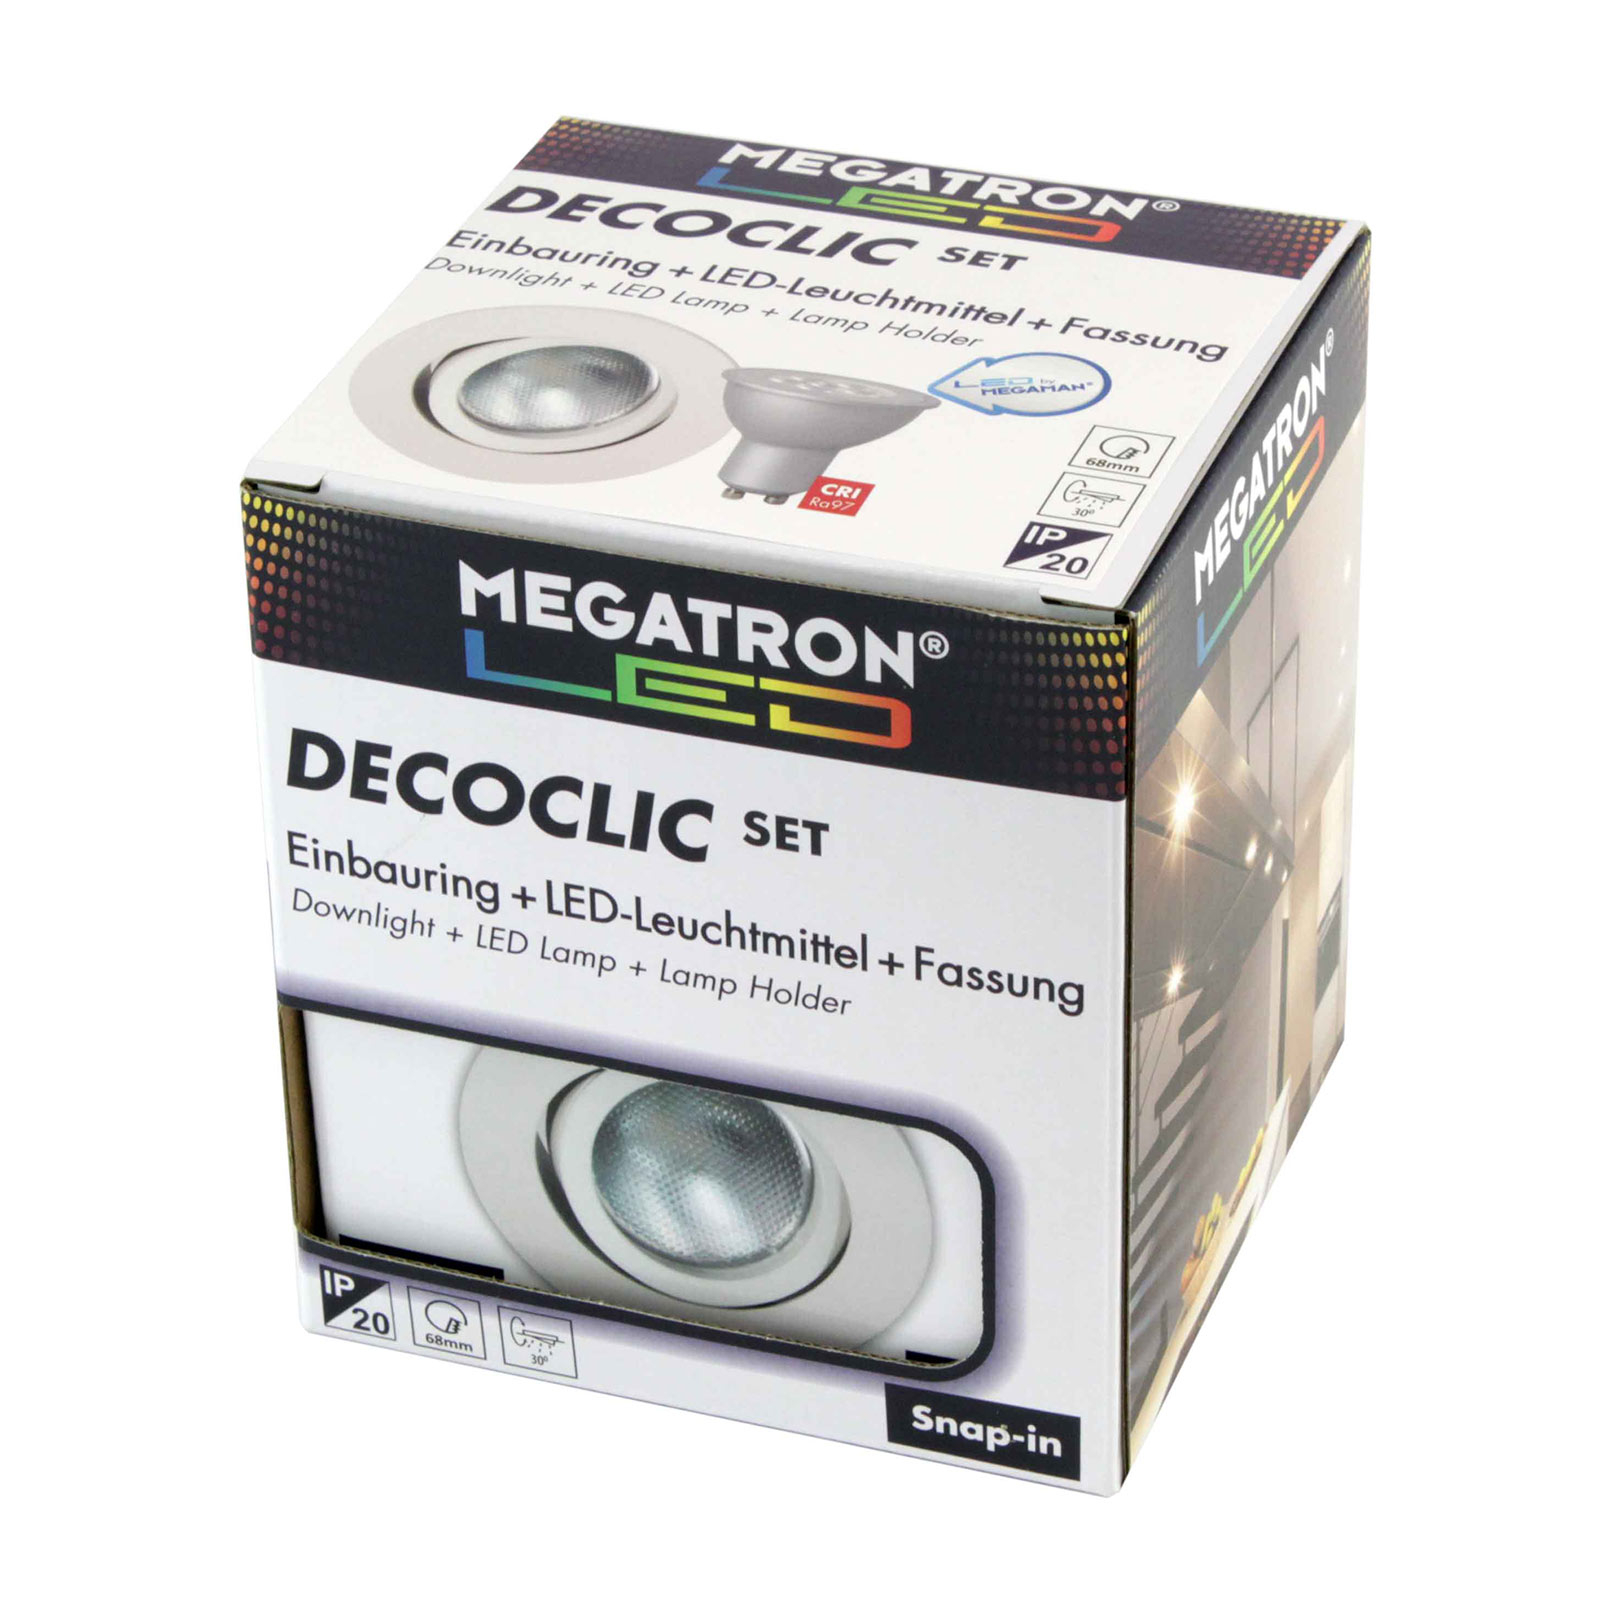 LED-kohdevalo Decoclic Set, GU10 6 W valkoinen